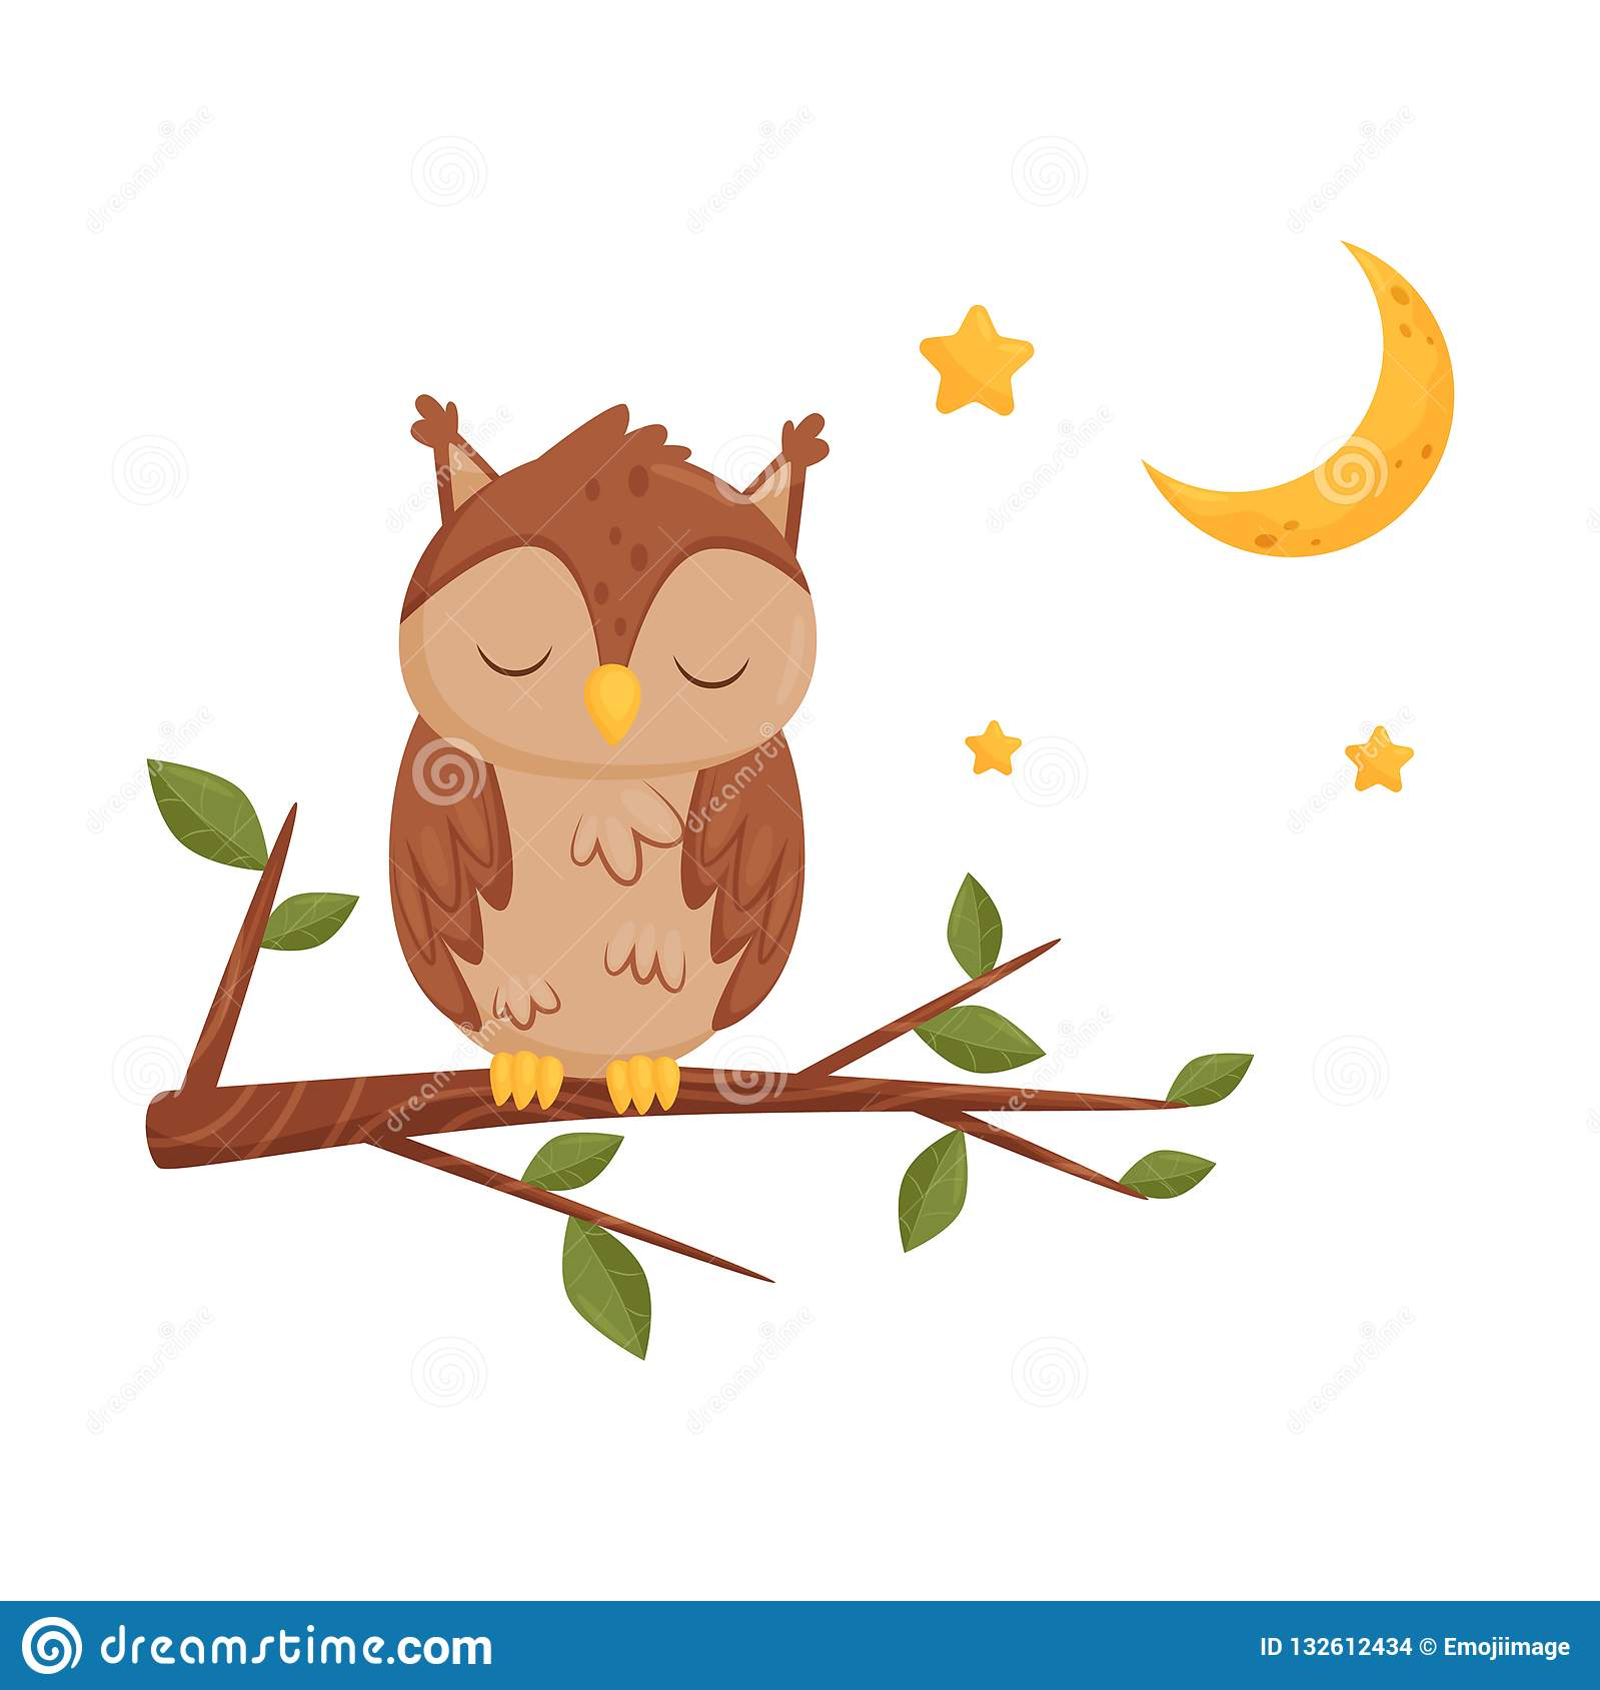 Cute Sleeping Owlet Sitting On A Branch Lovely Bird Cartoon